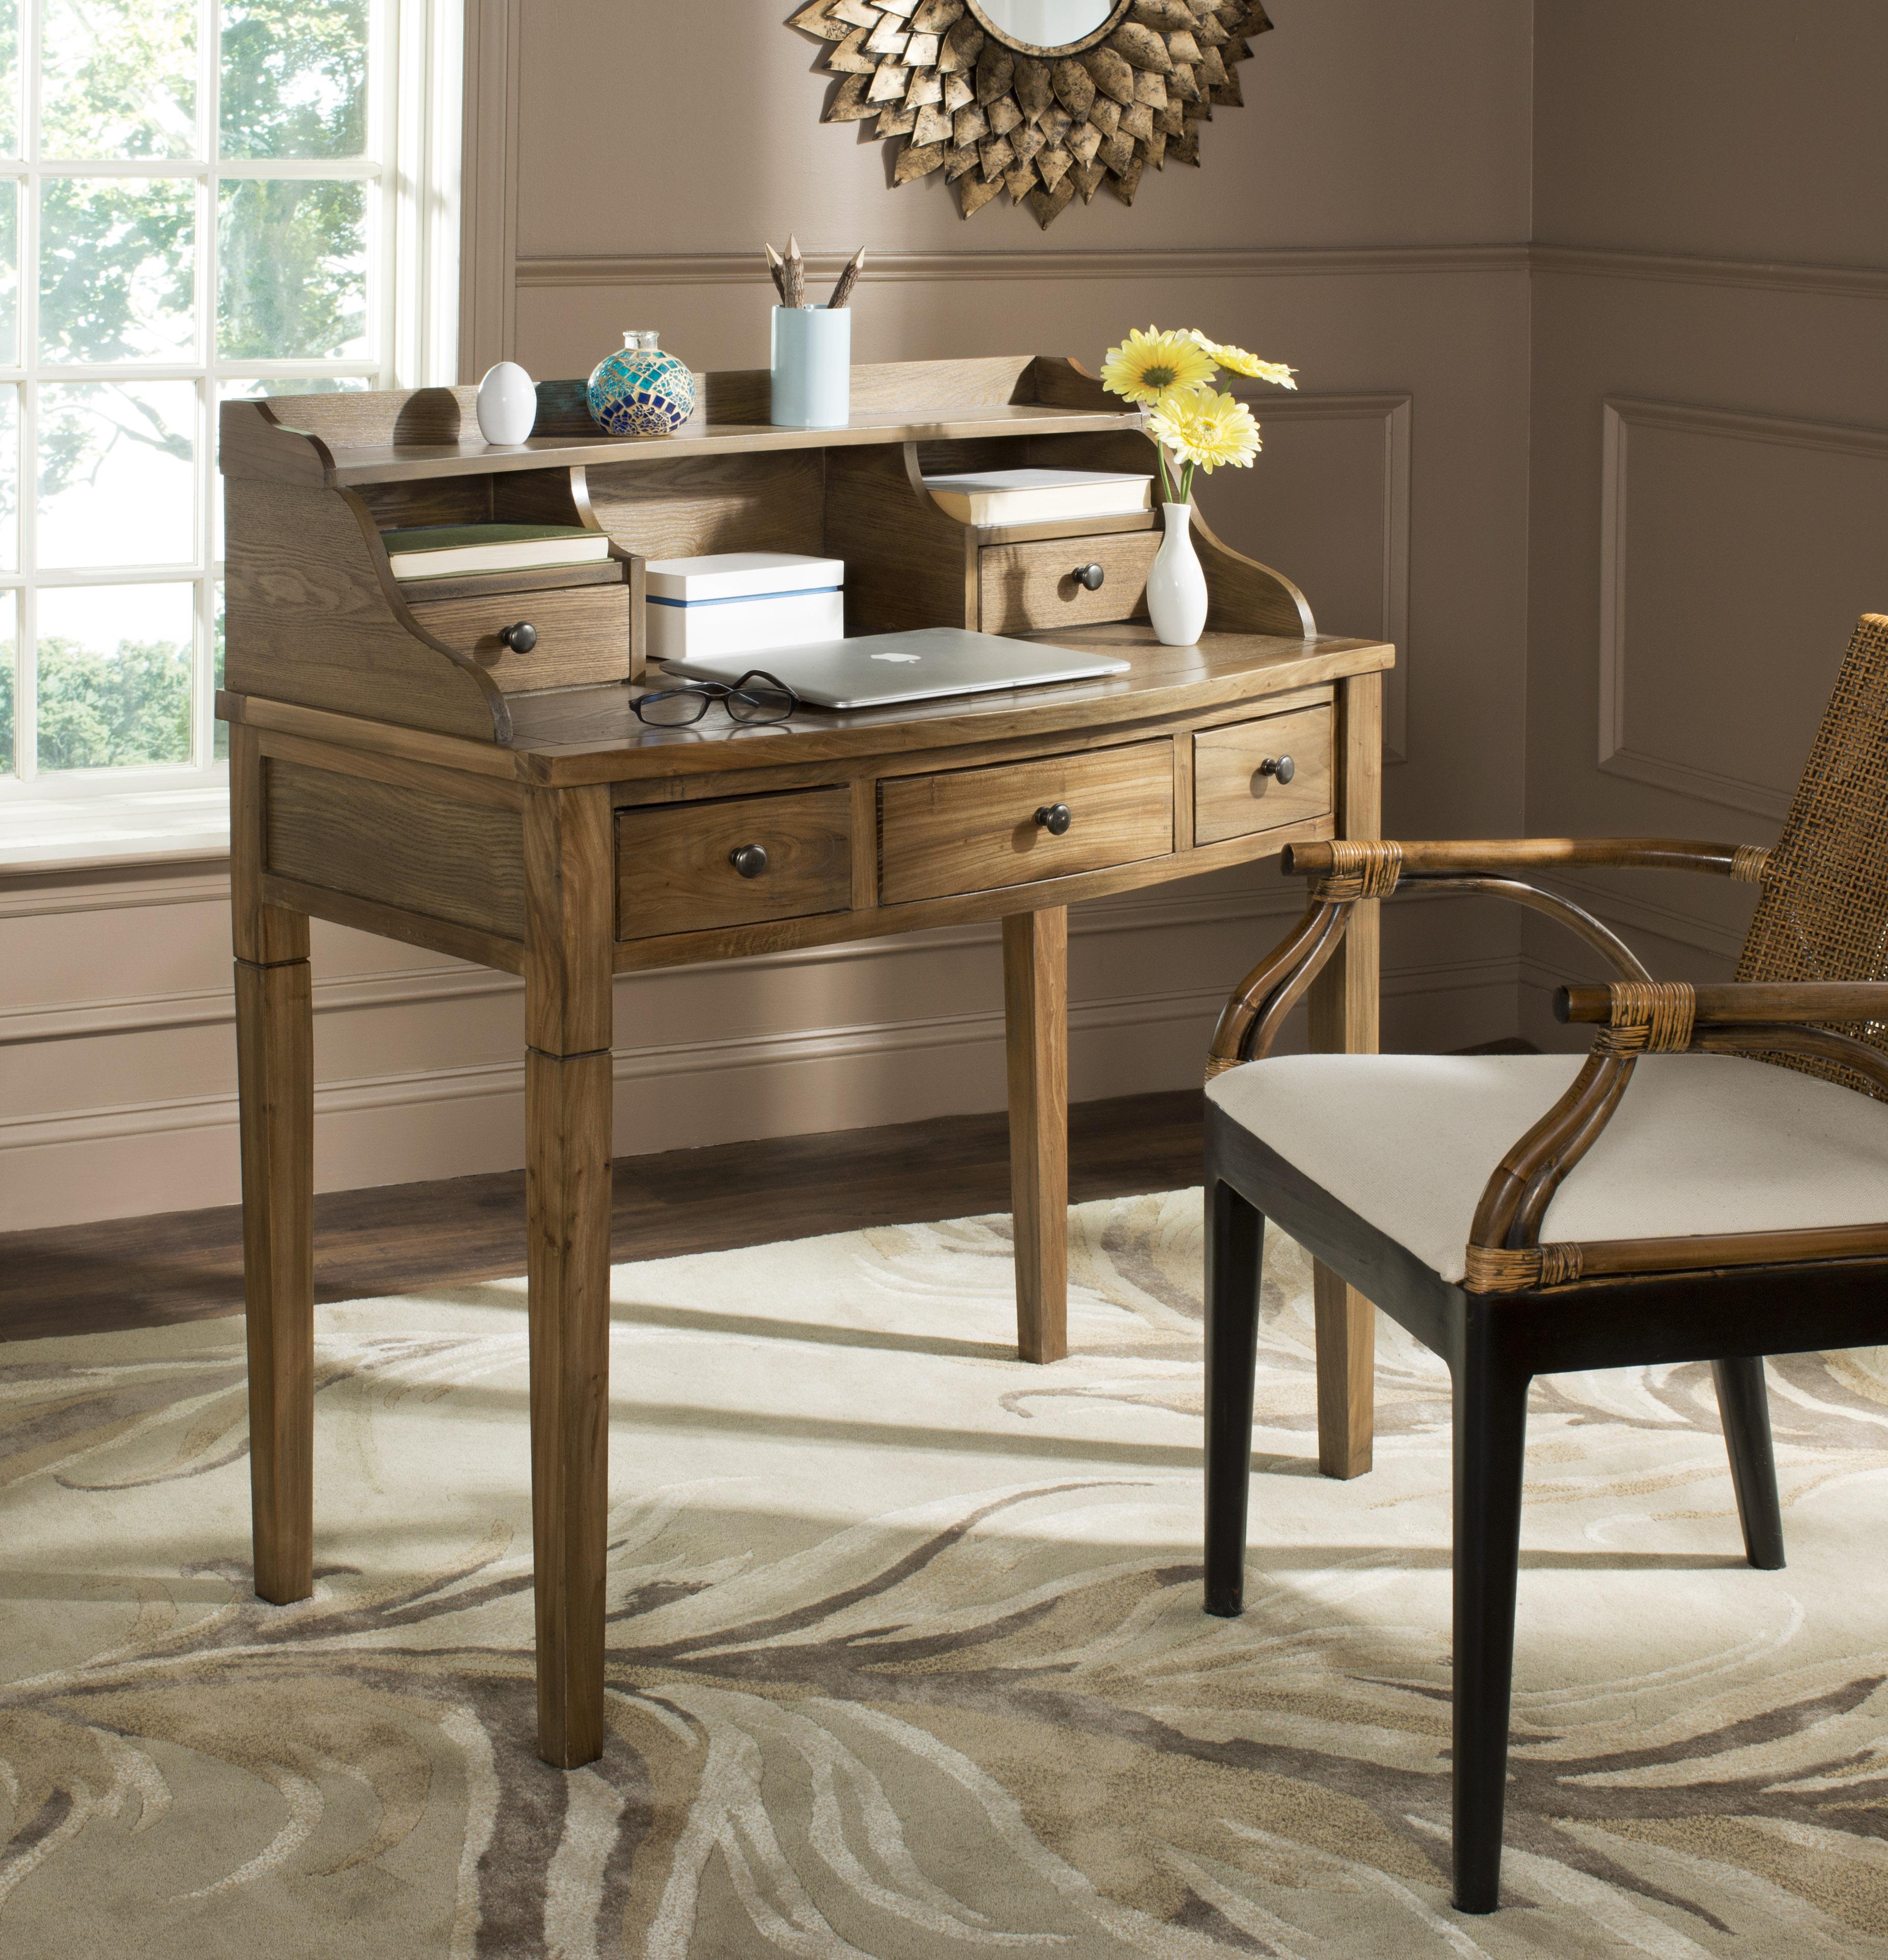 Safavieh American Home Landon Writing Desk - Walmart.com